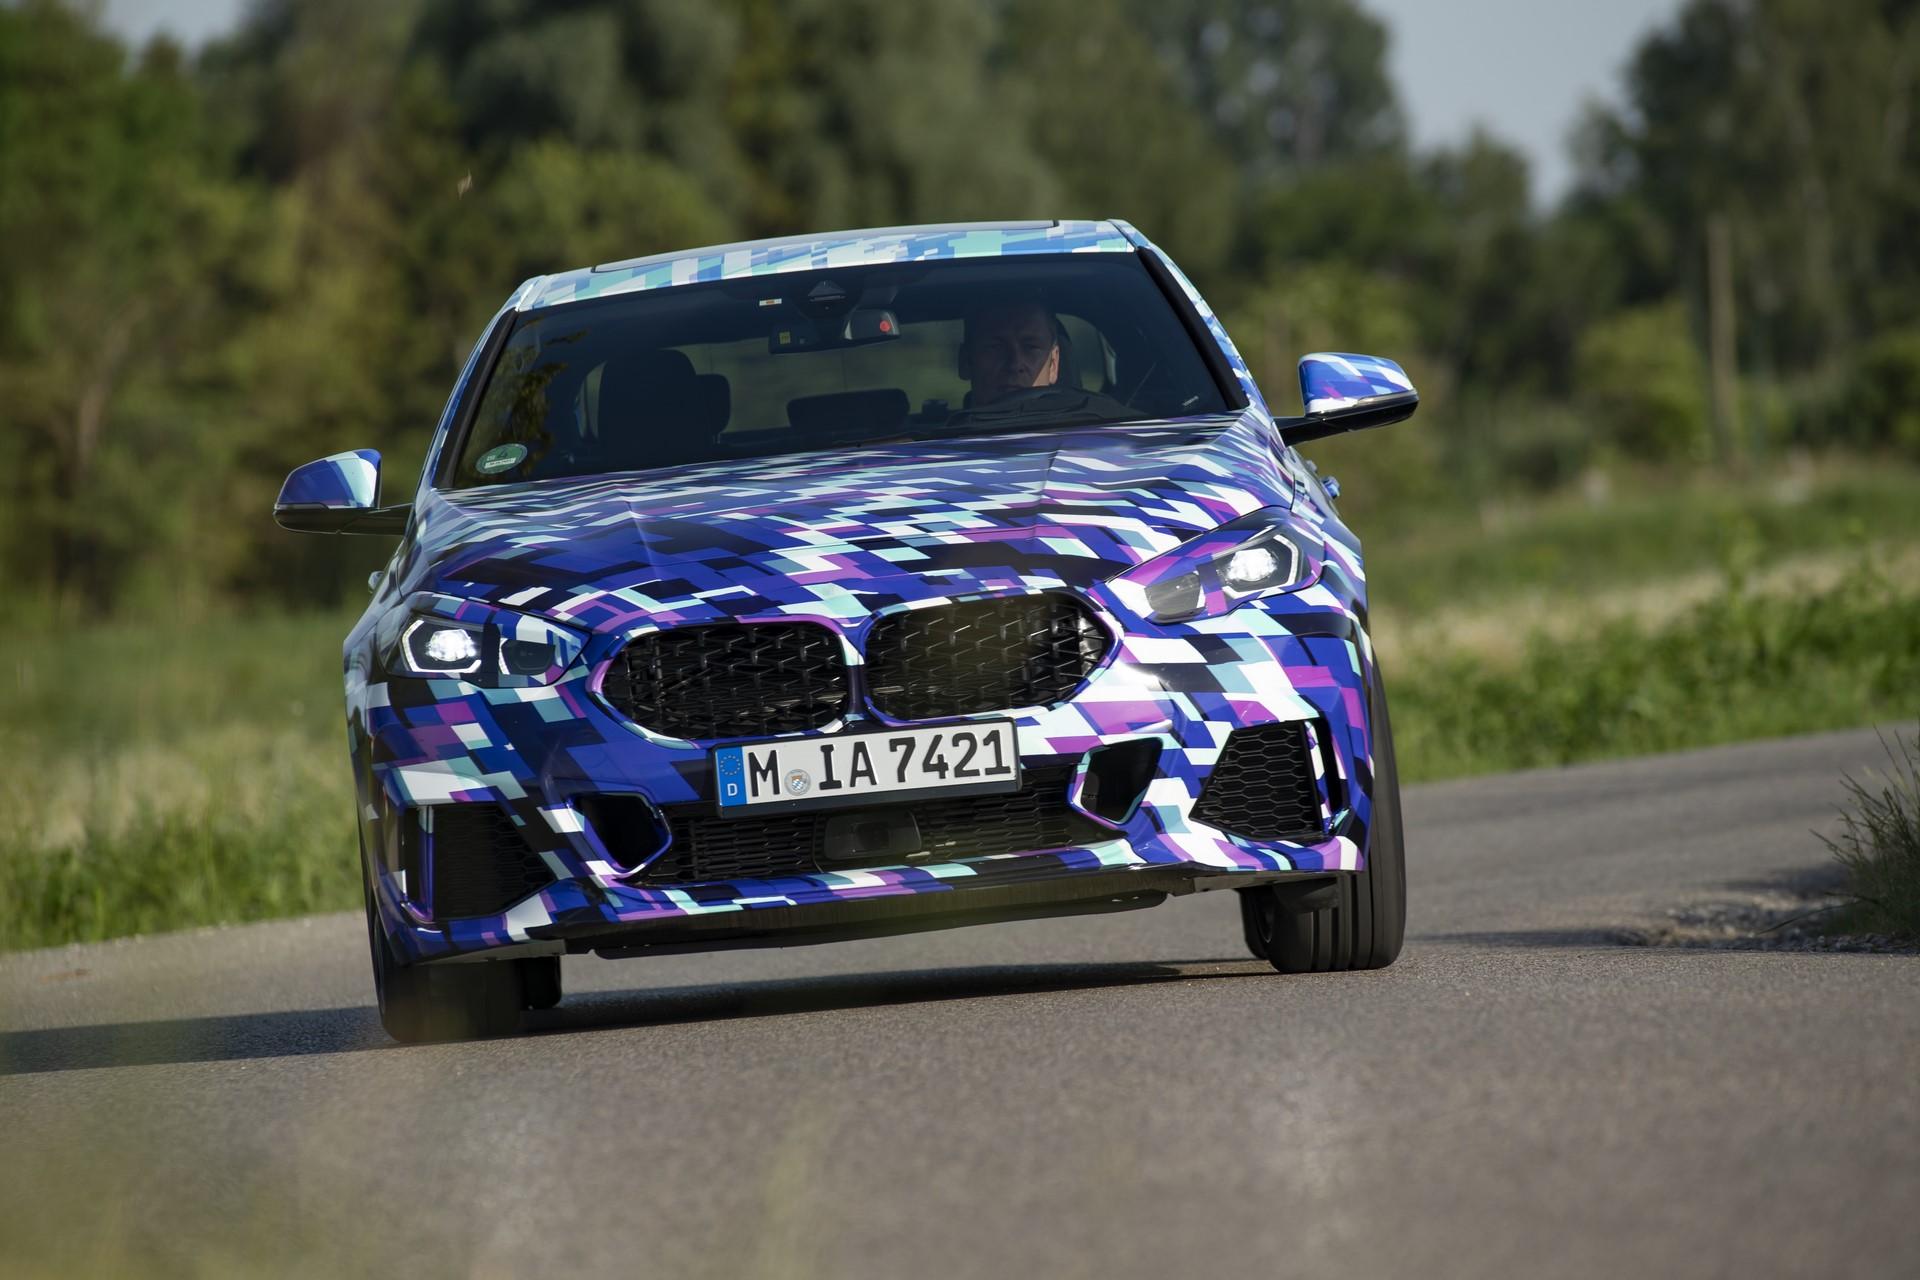 BMW-2-Series-Gran-Coupe-2020-spy-photos-7